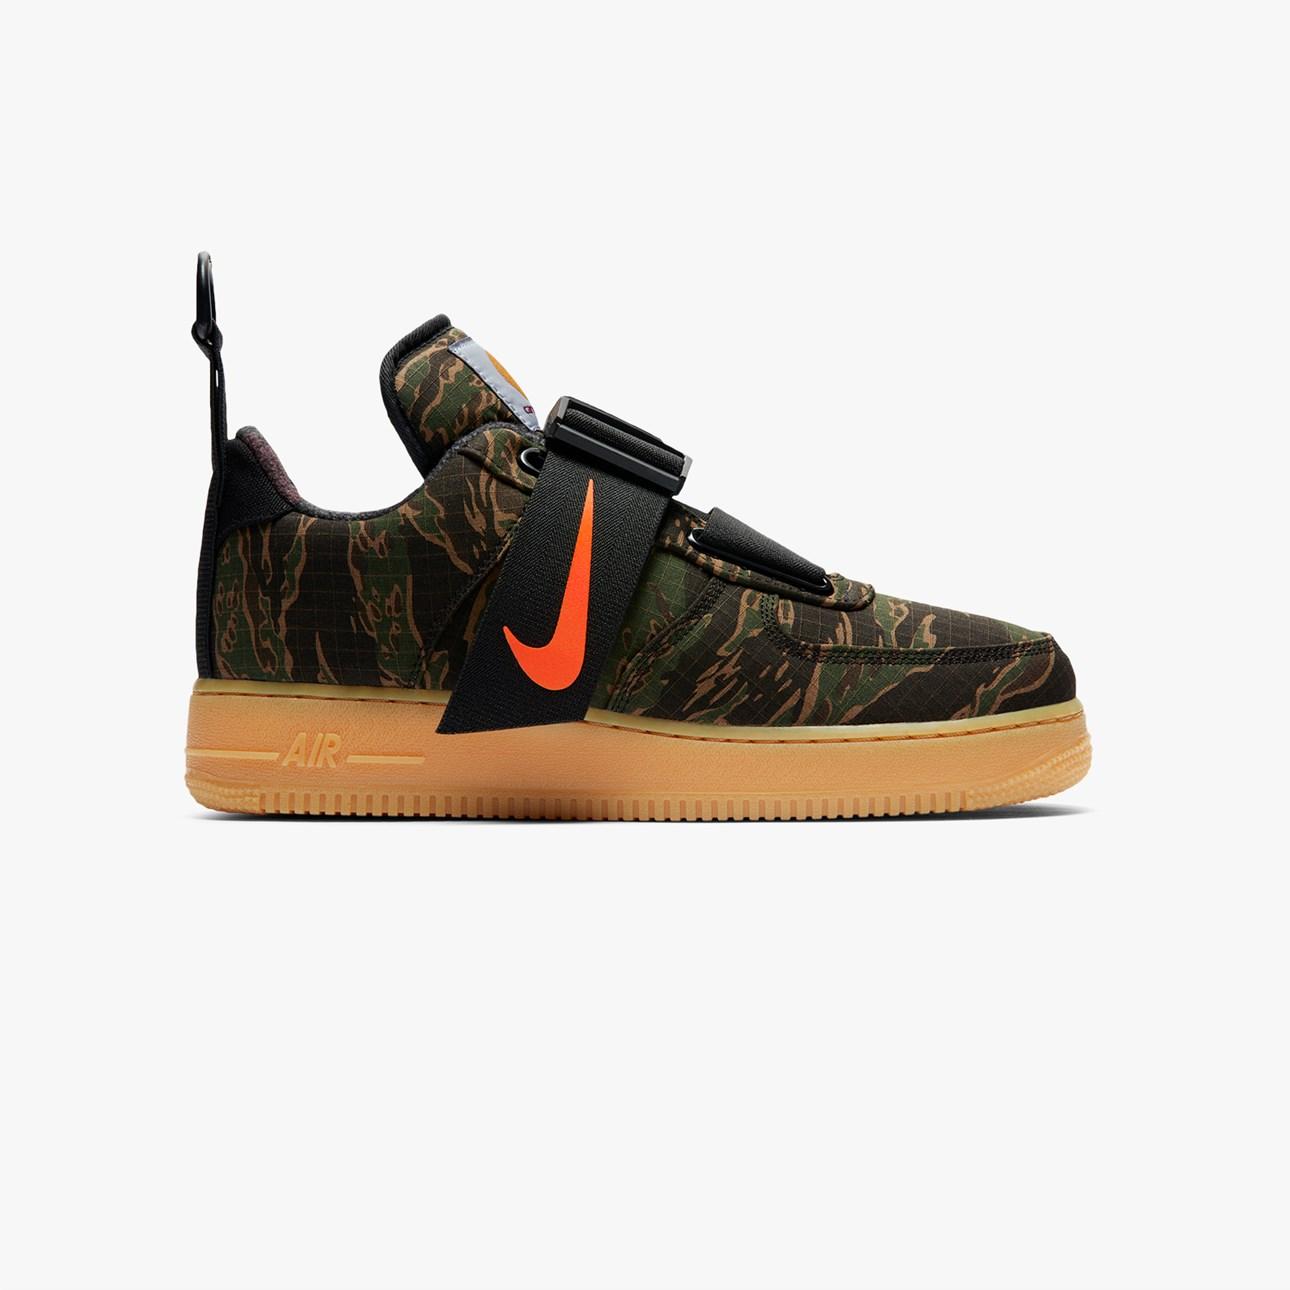 Nike Sportswear Air Force 1 Utility Low Premium x Carhartt WIP